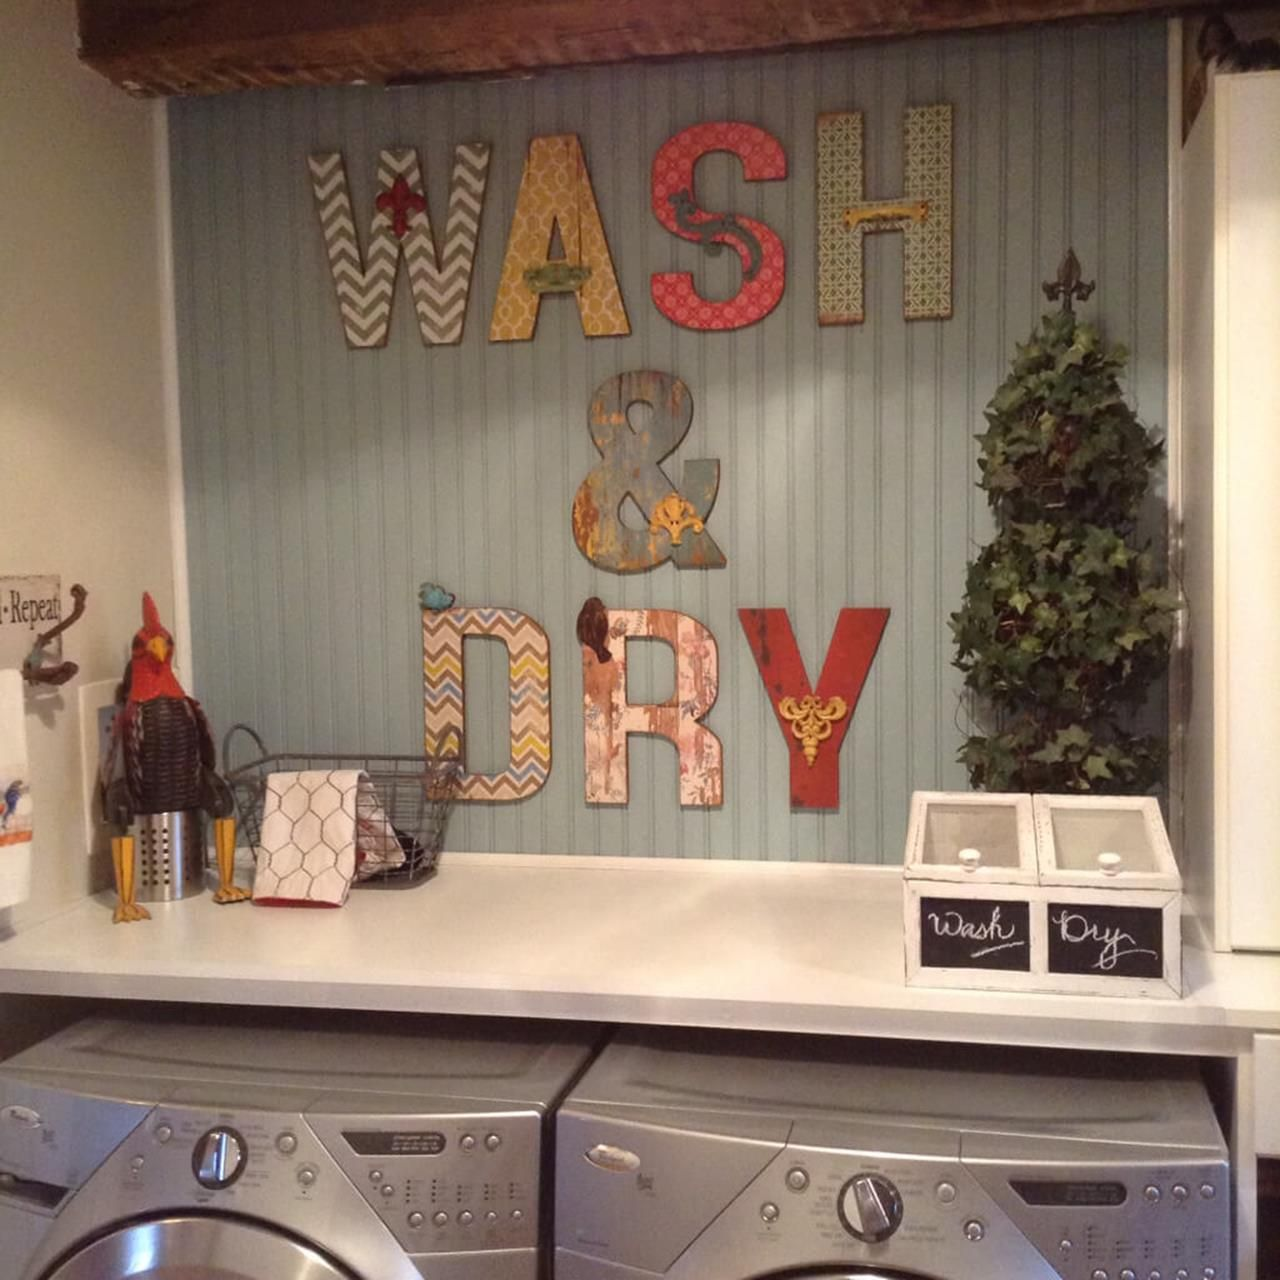 37 Charming Laundry Room Decorating Ideas Wall Art Vintage